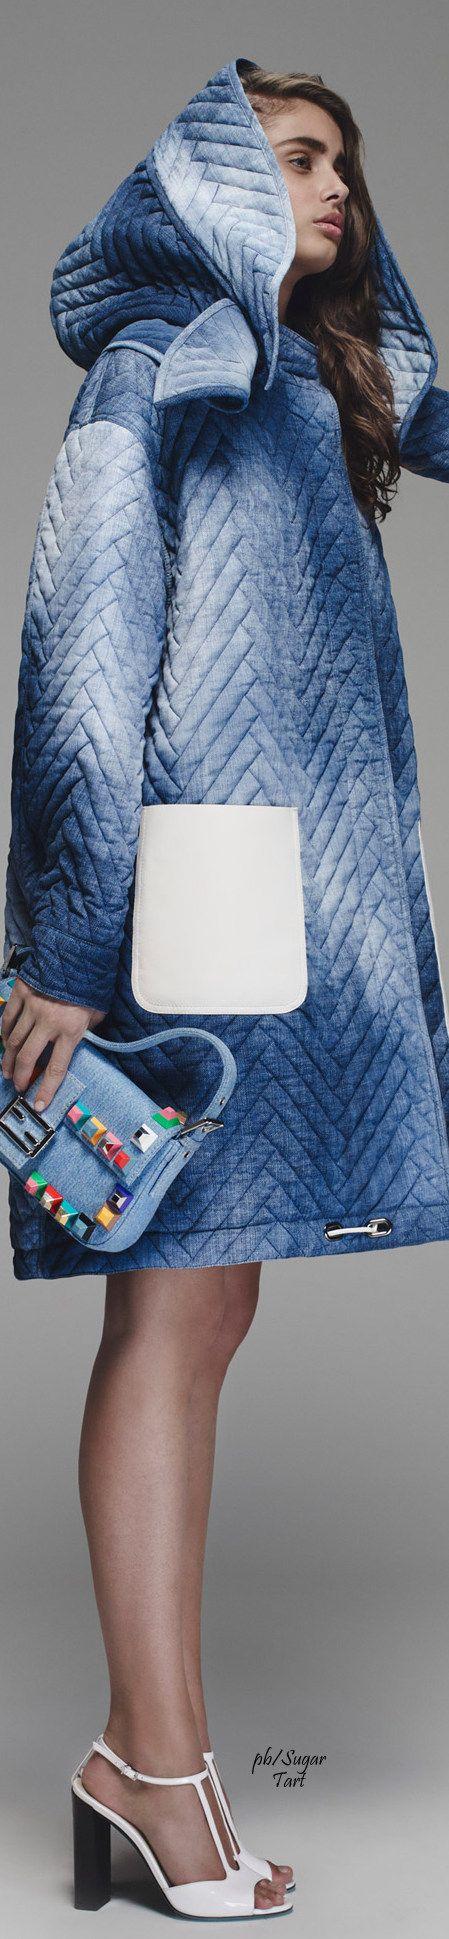 Fendi Resort 2016 blue coat.  women fashion outfit clothing style apparel @roressclothes closet ideas